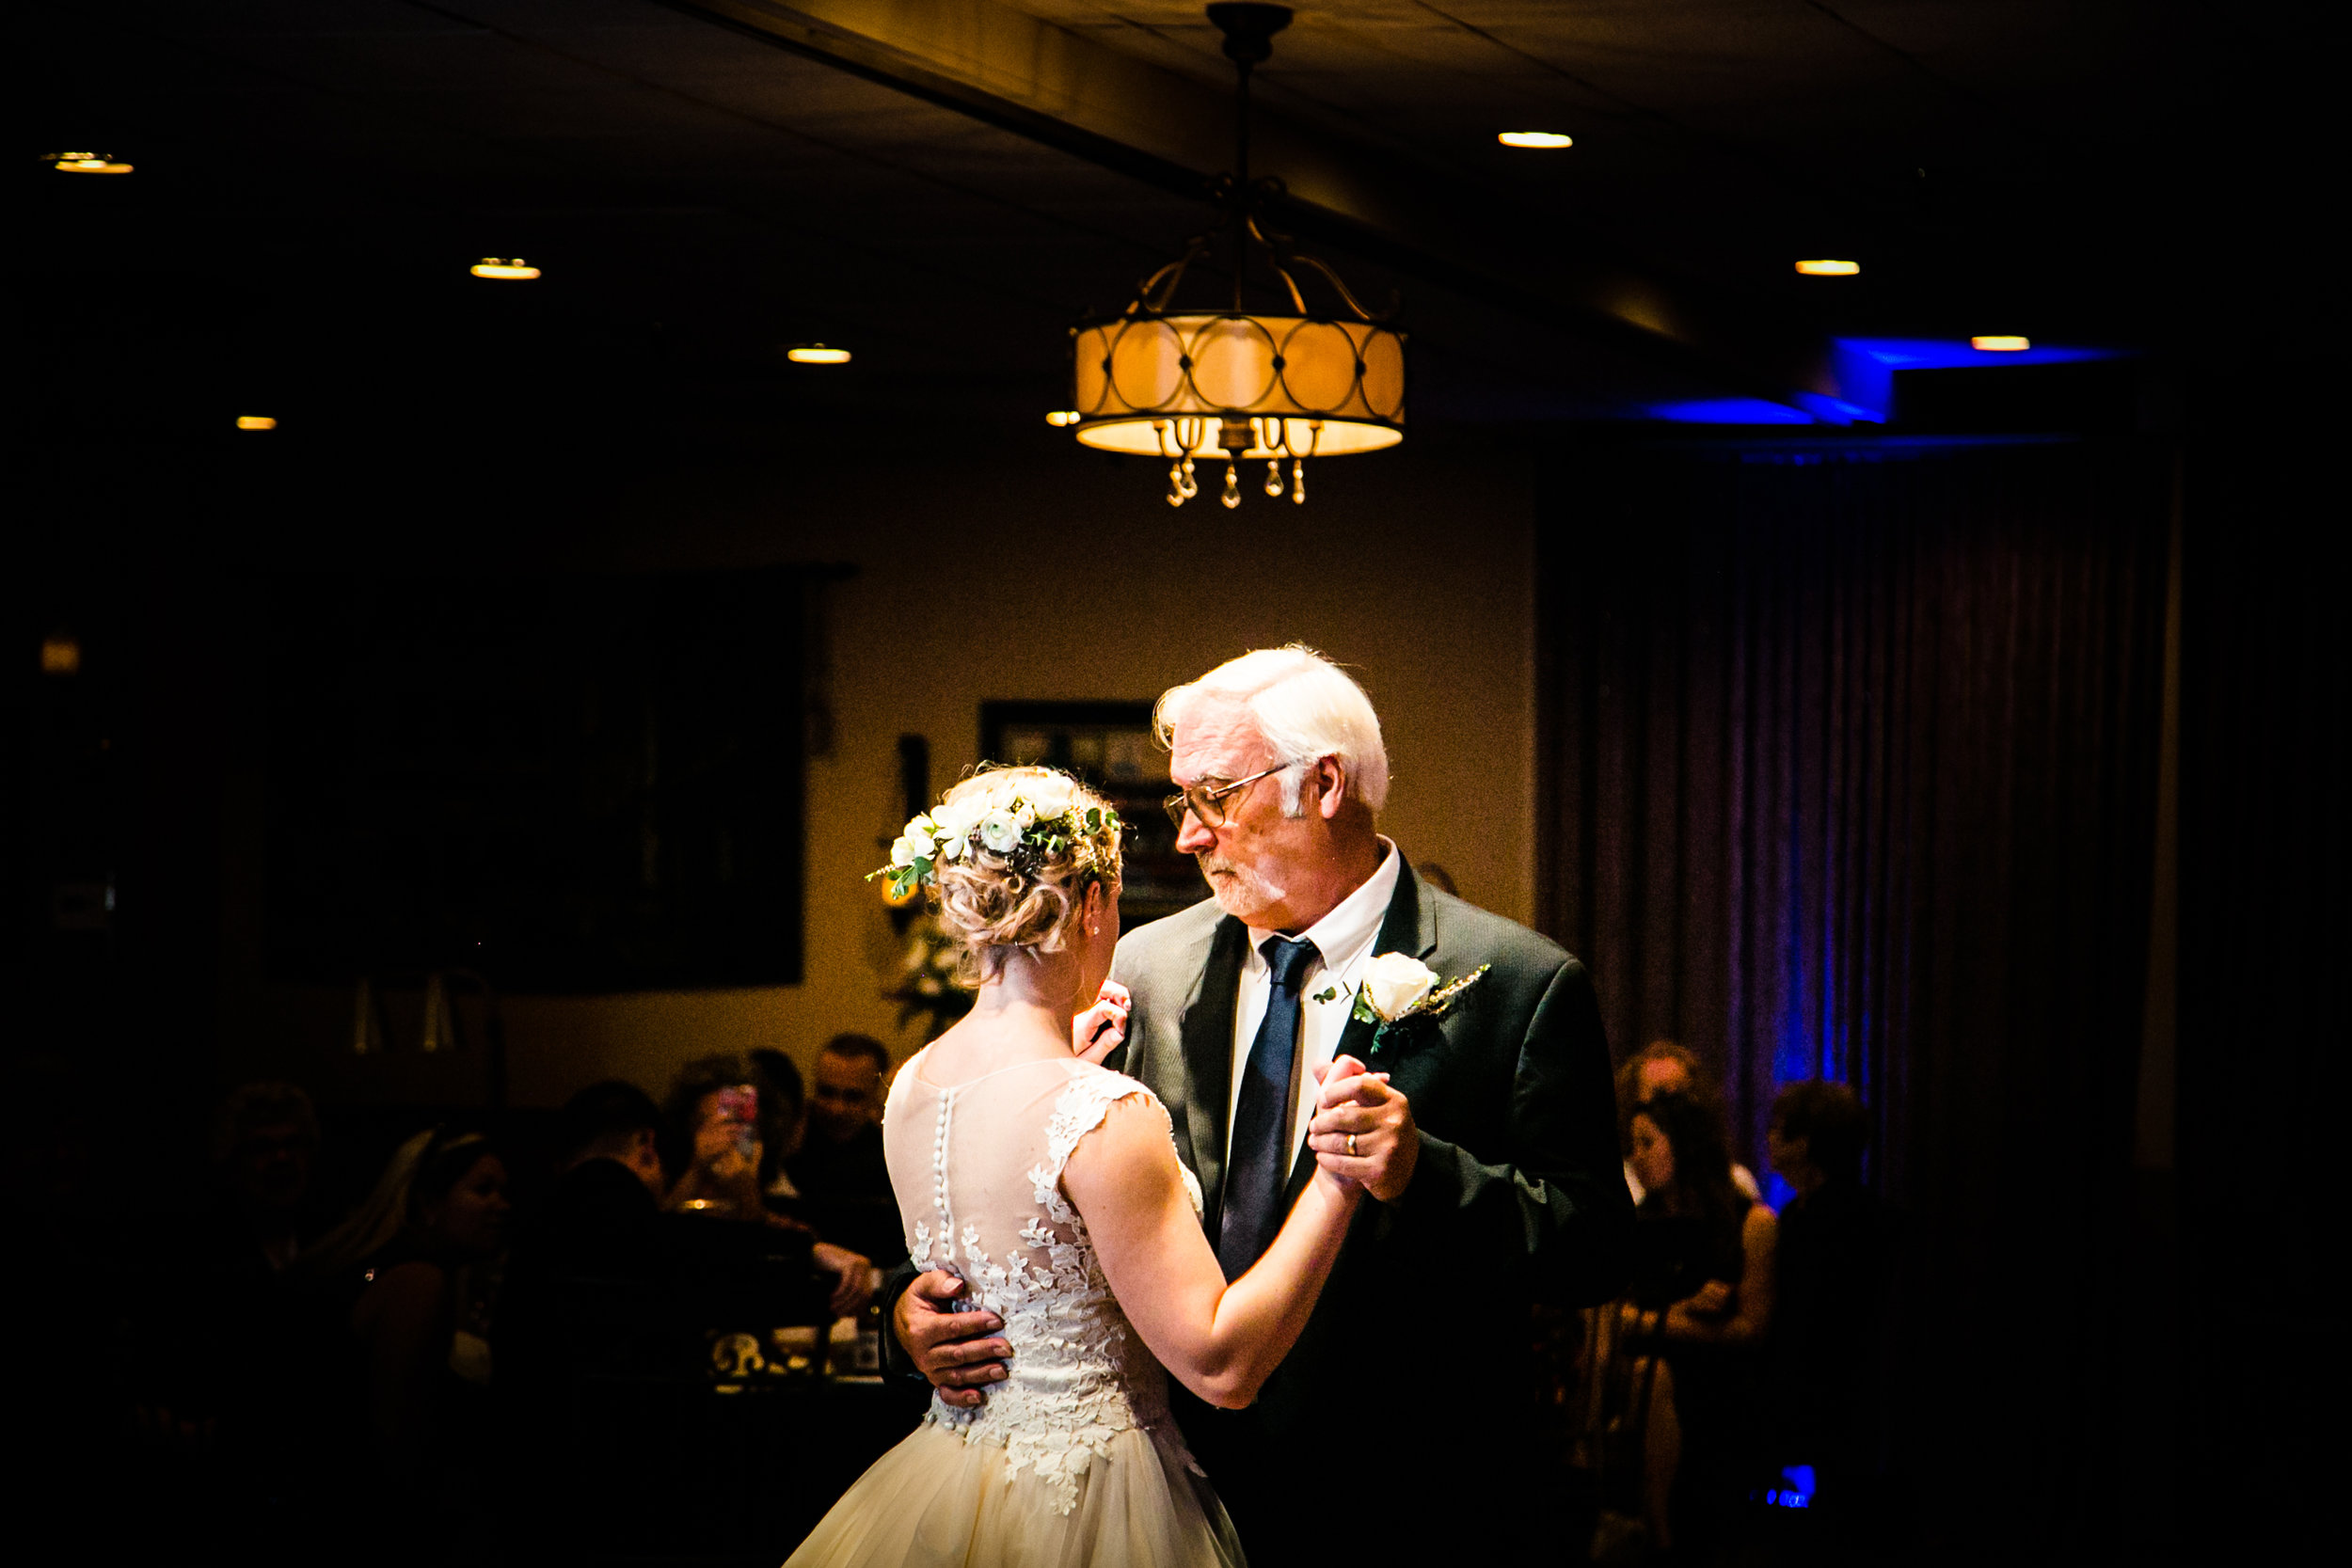 LA LUNA BANQUET HALL WEDDING BENSALEM - 101.jpg